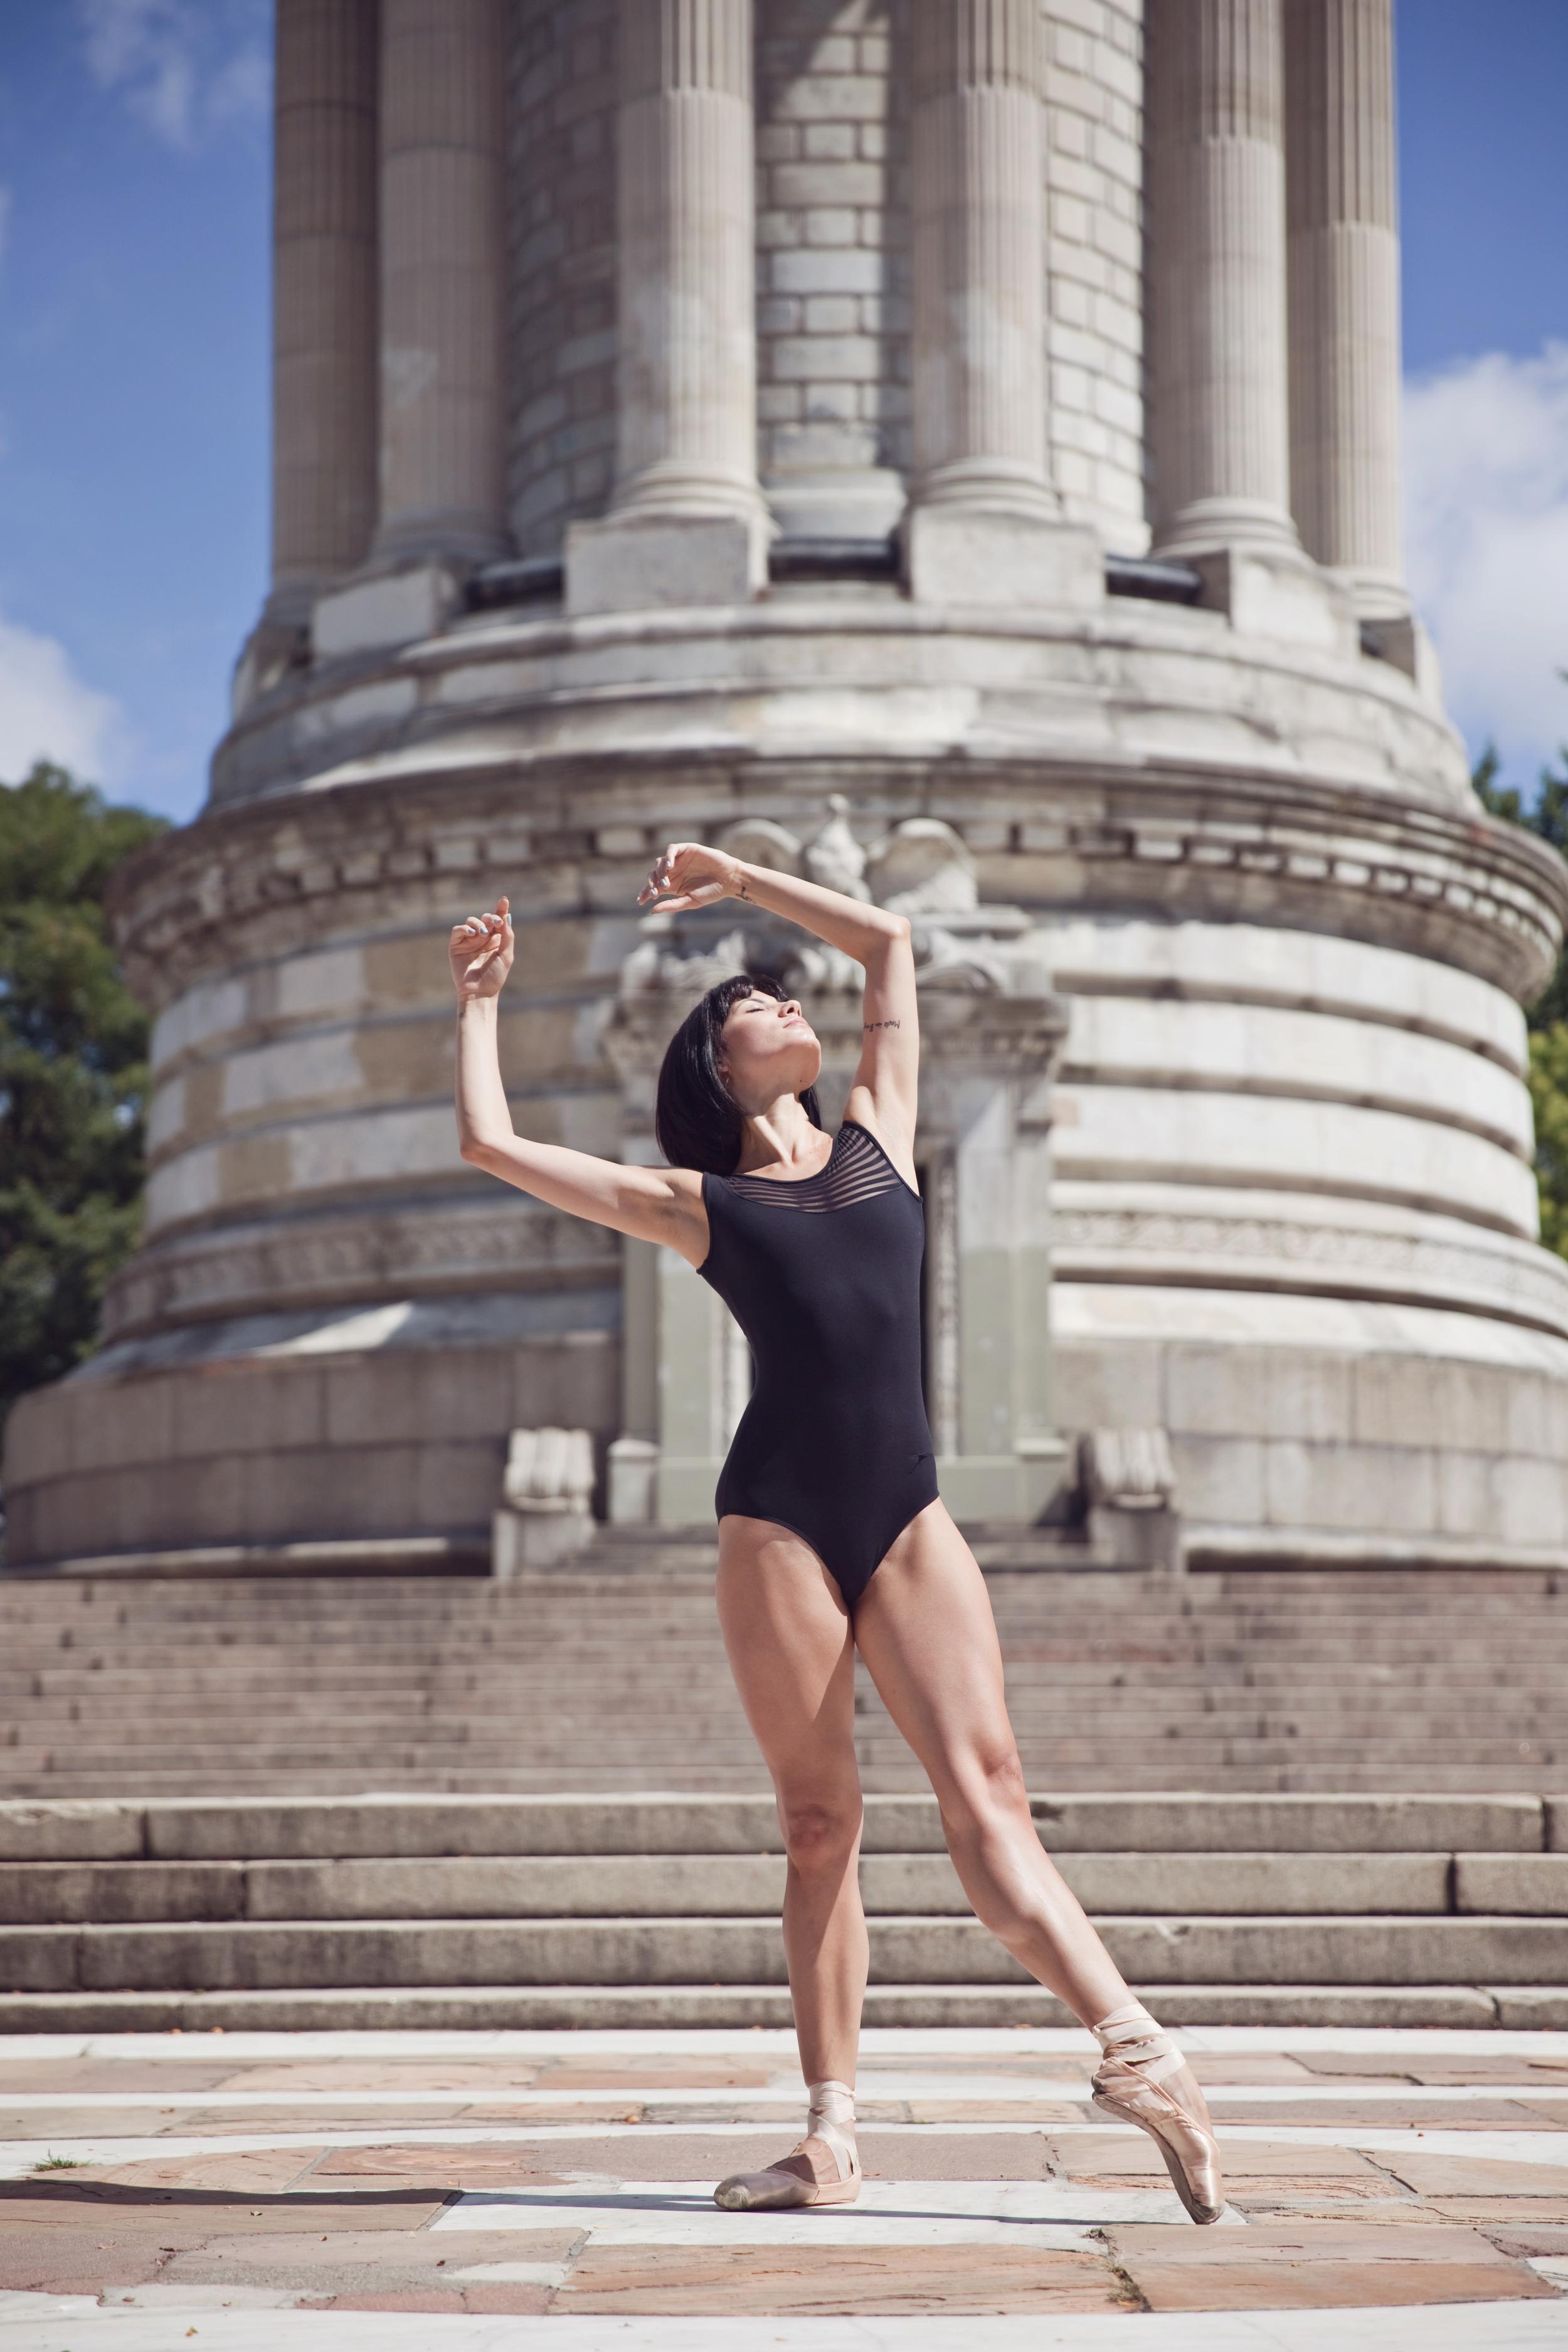 Luciana Voltolini for FLX, Renata Pavam Photography